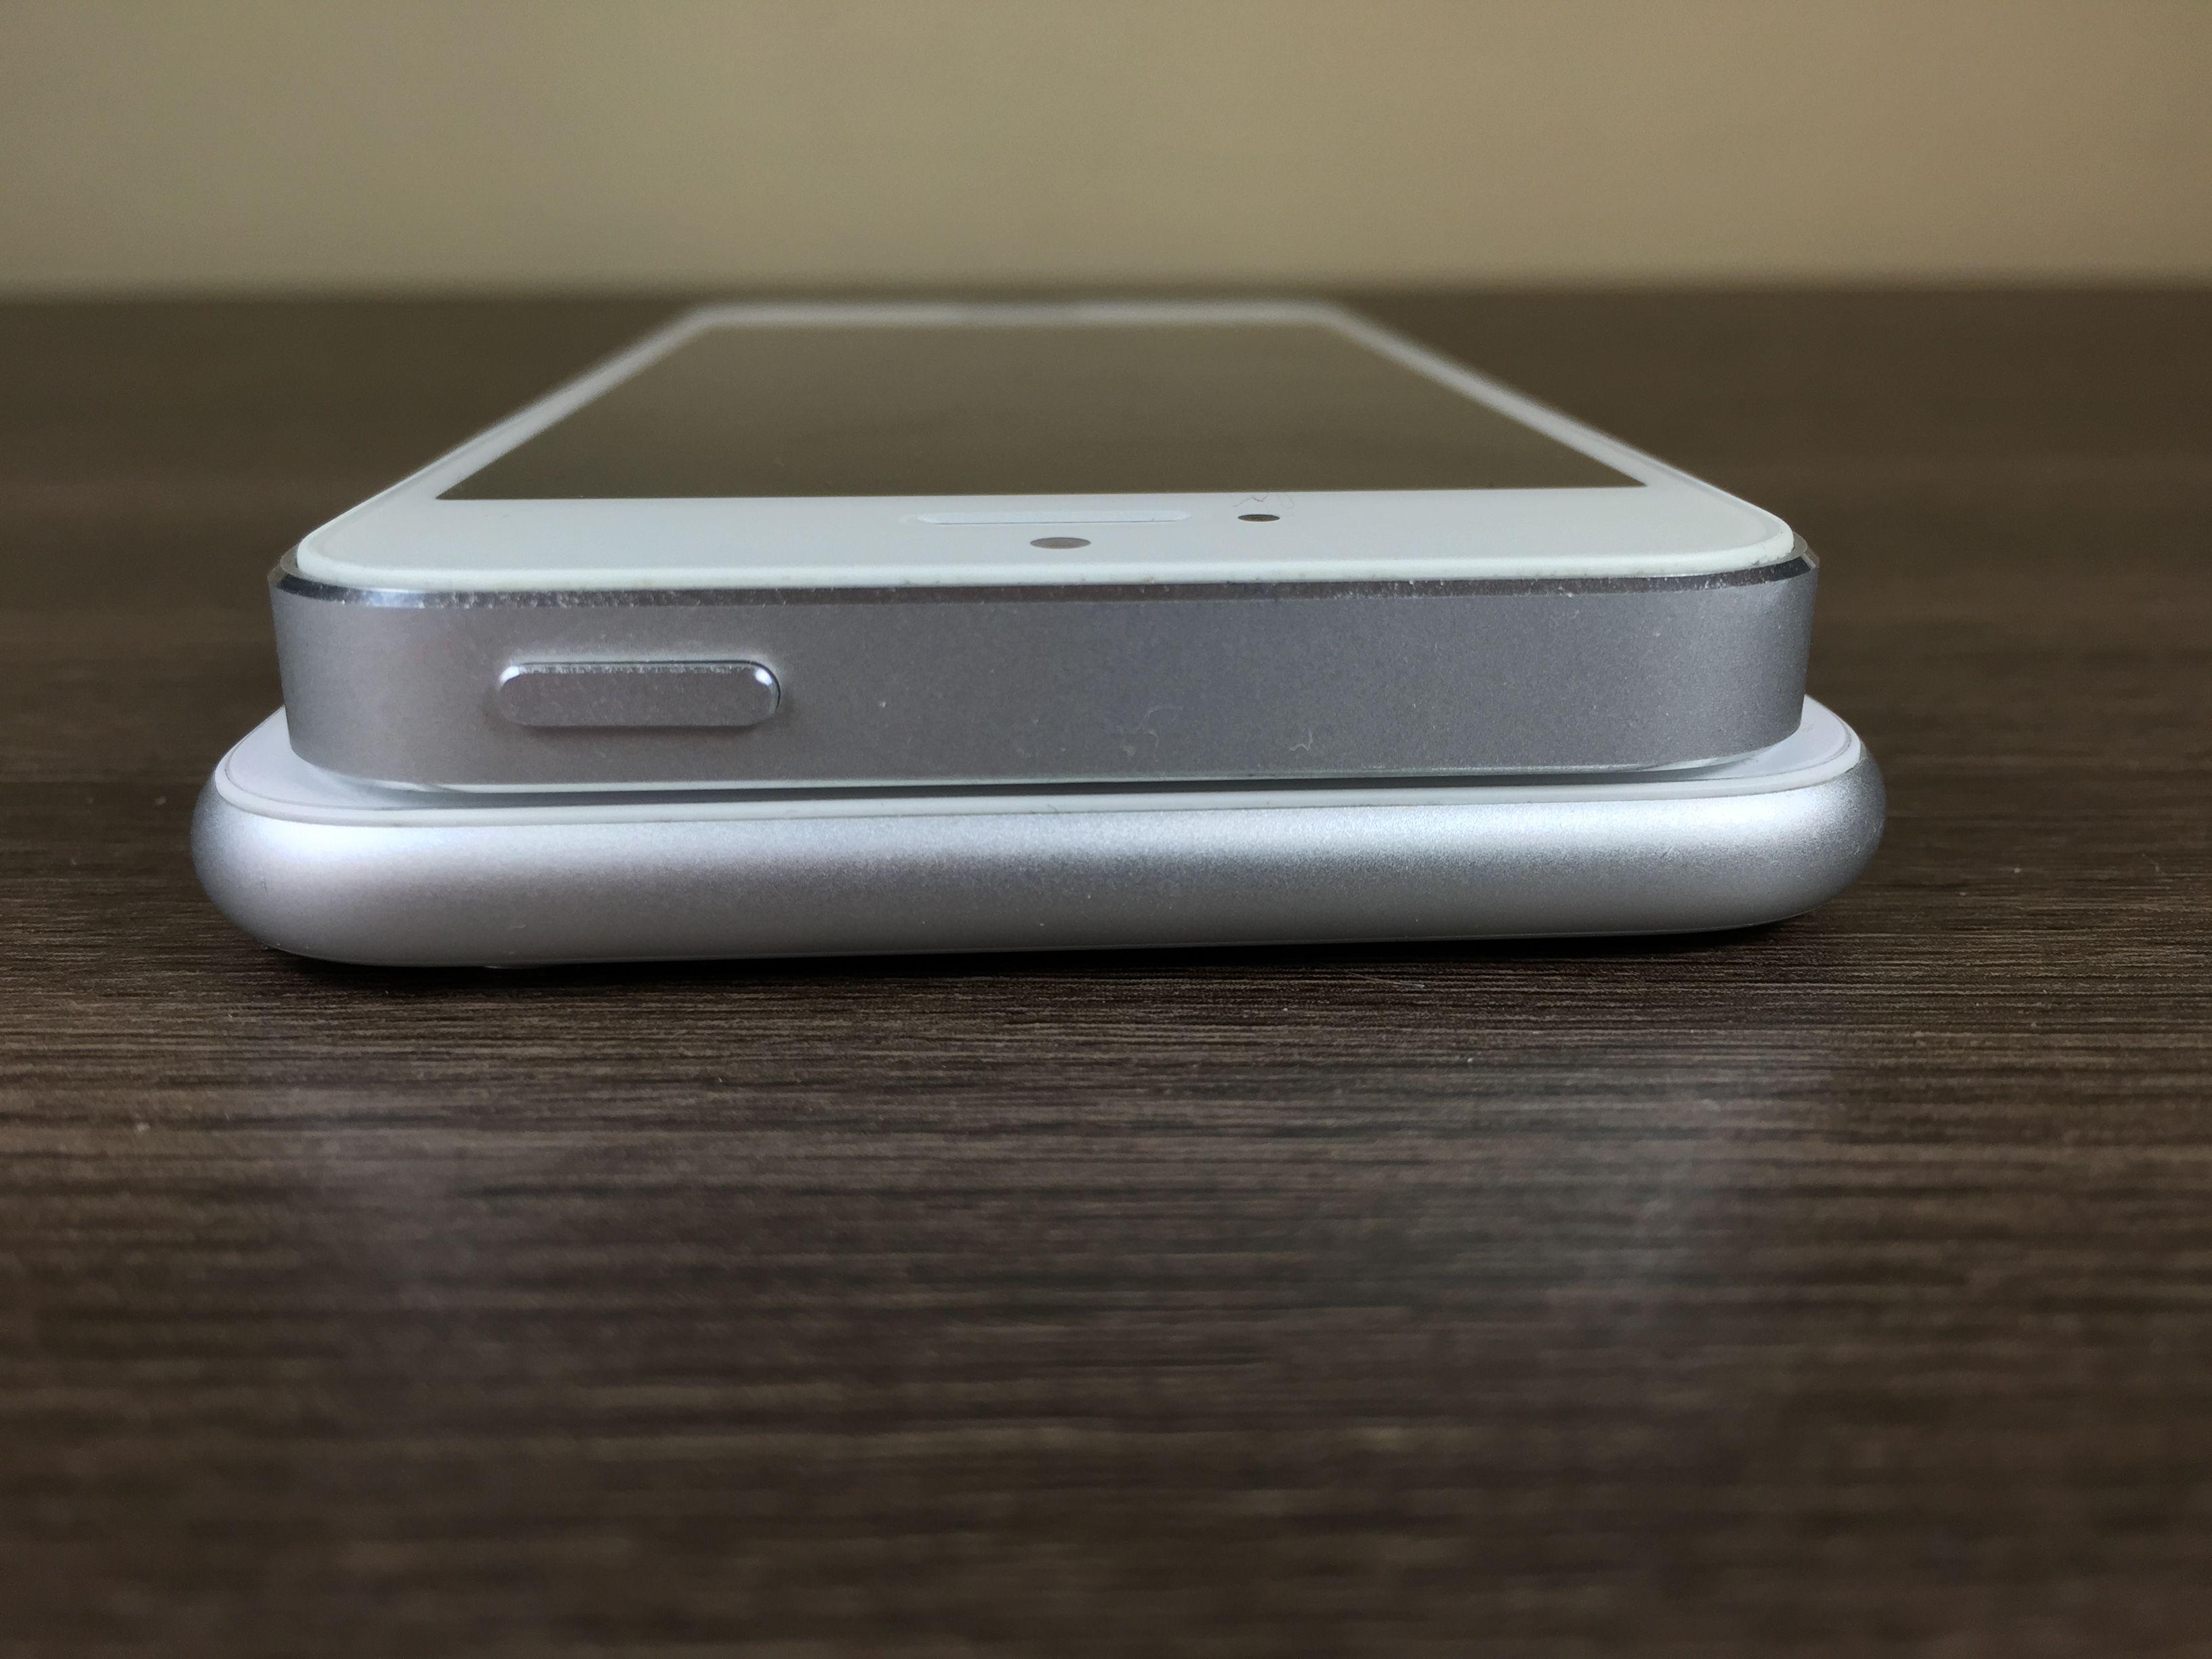 aa649d92459 Comparativo: iPhone 5S vs iPhone 6 - Tudocelular.com